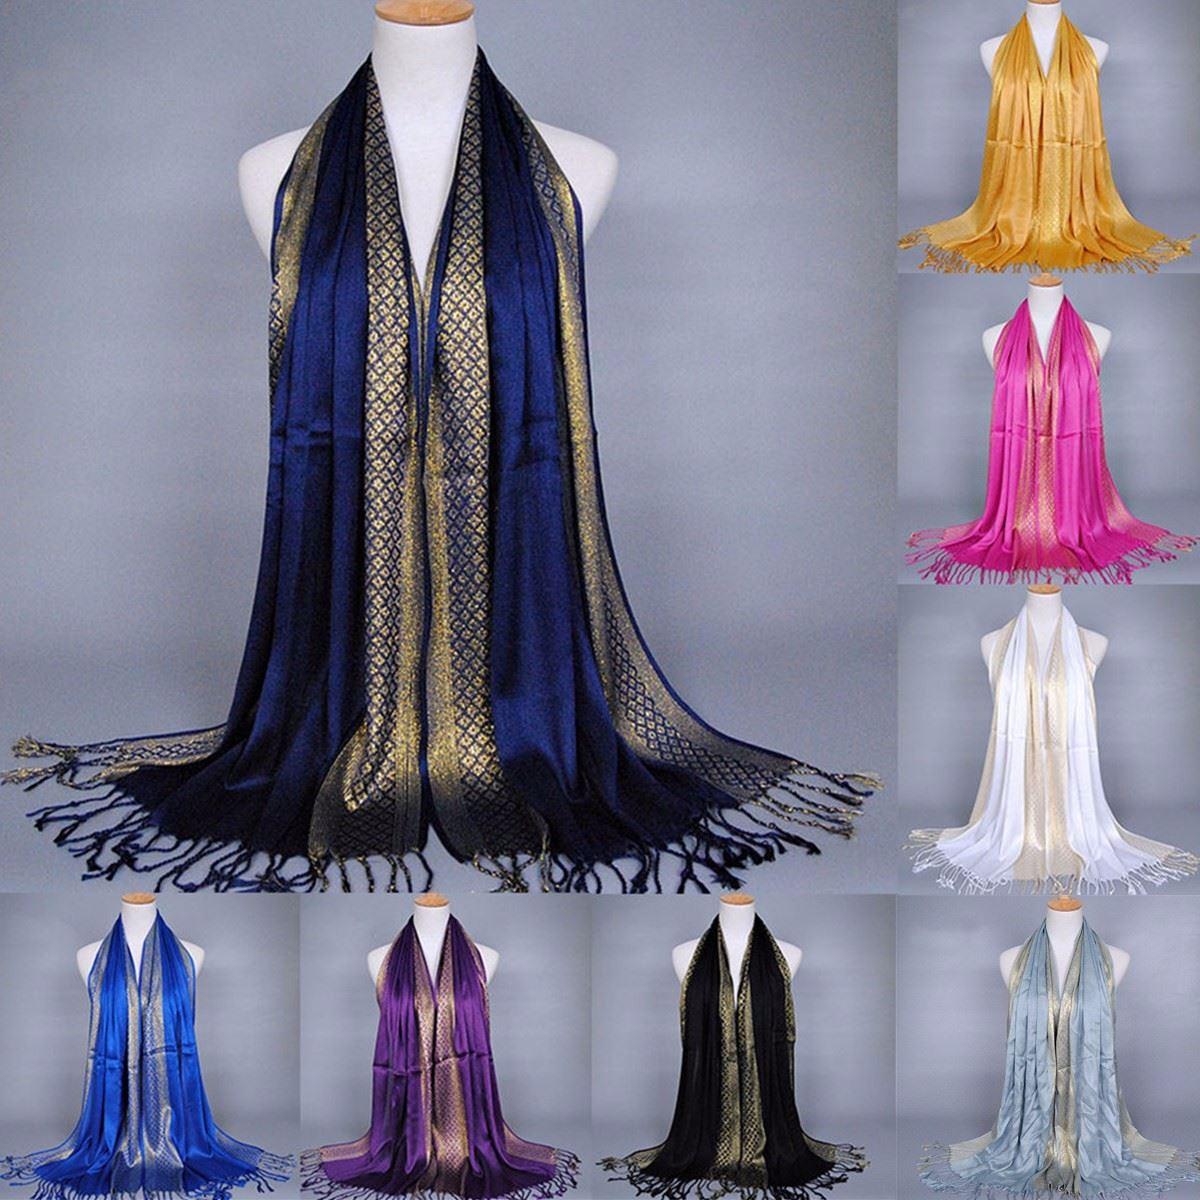 Women Tassel Pashmina Silk Scarf Lady Shade Stole Shawl Wraps Cotton Soft Muslim Hijab Scarves Plaid Long Retro Fringe Poncho